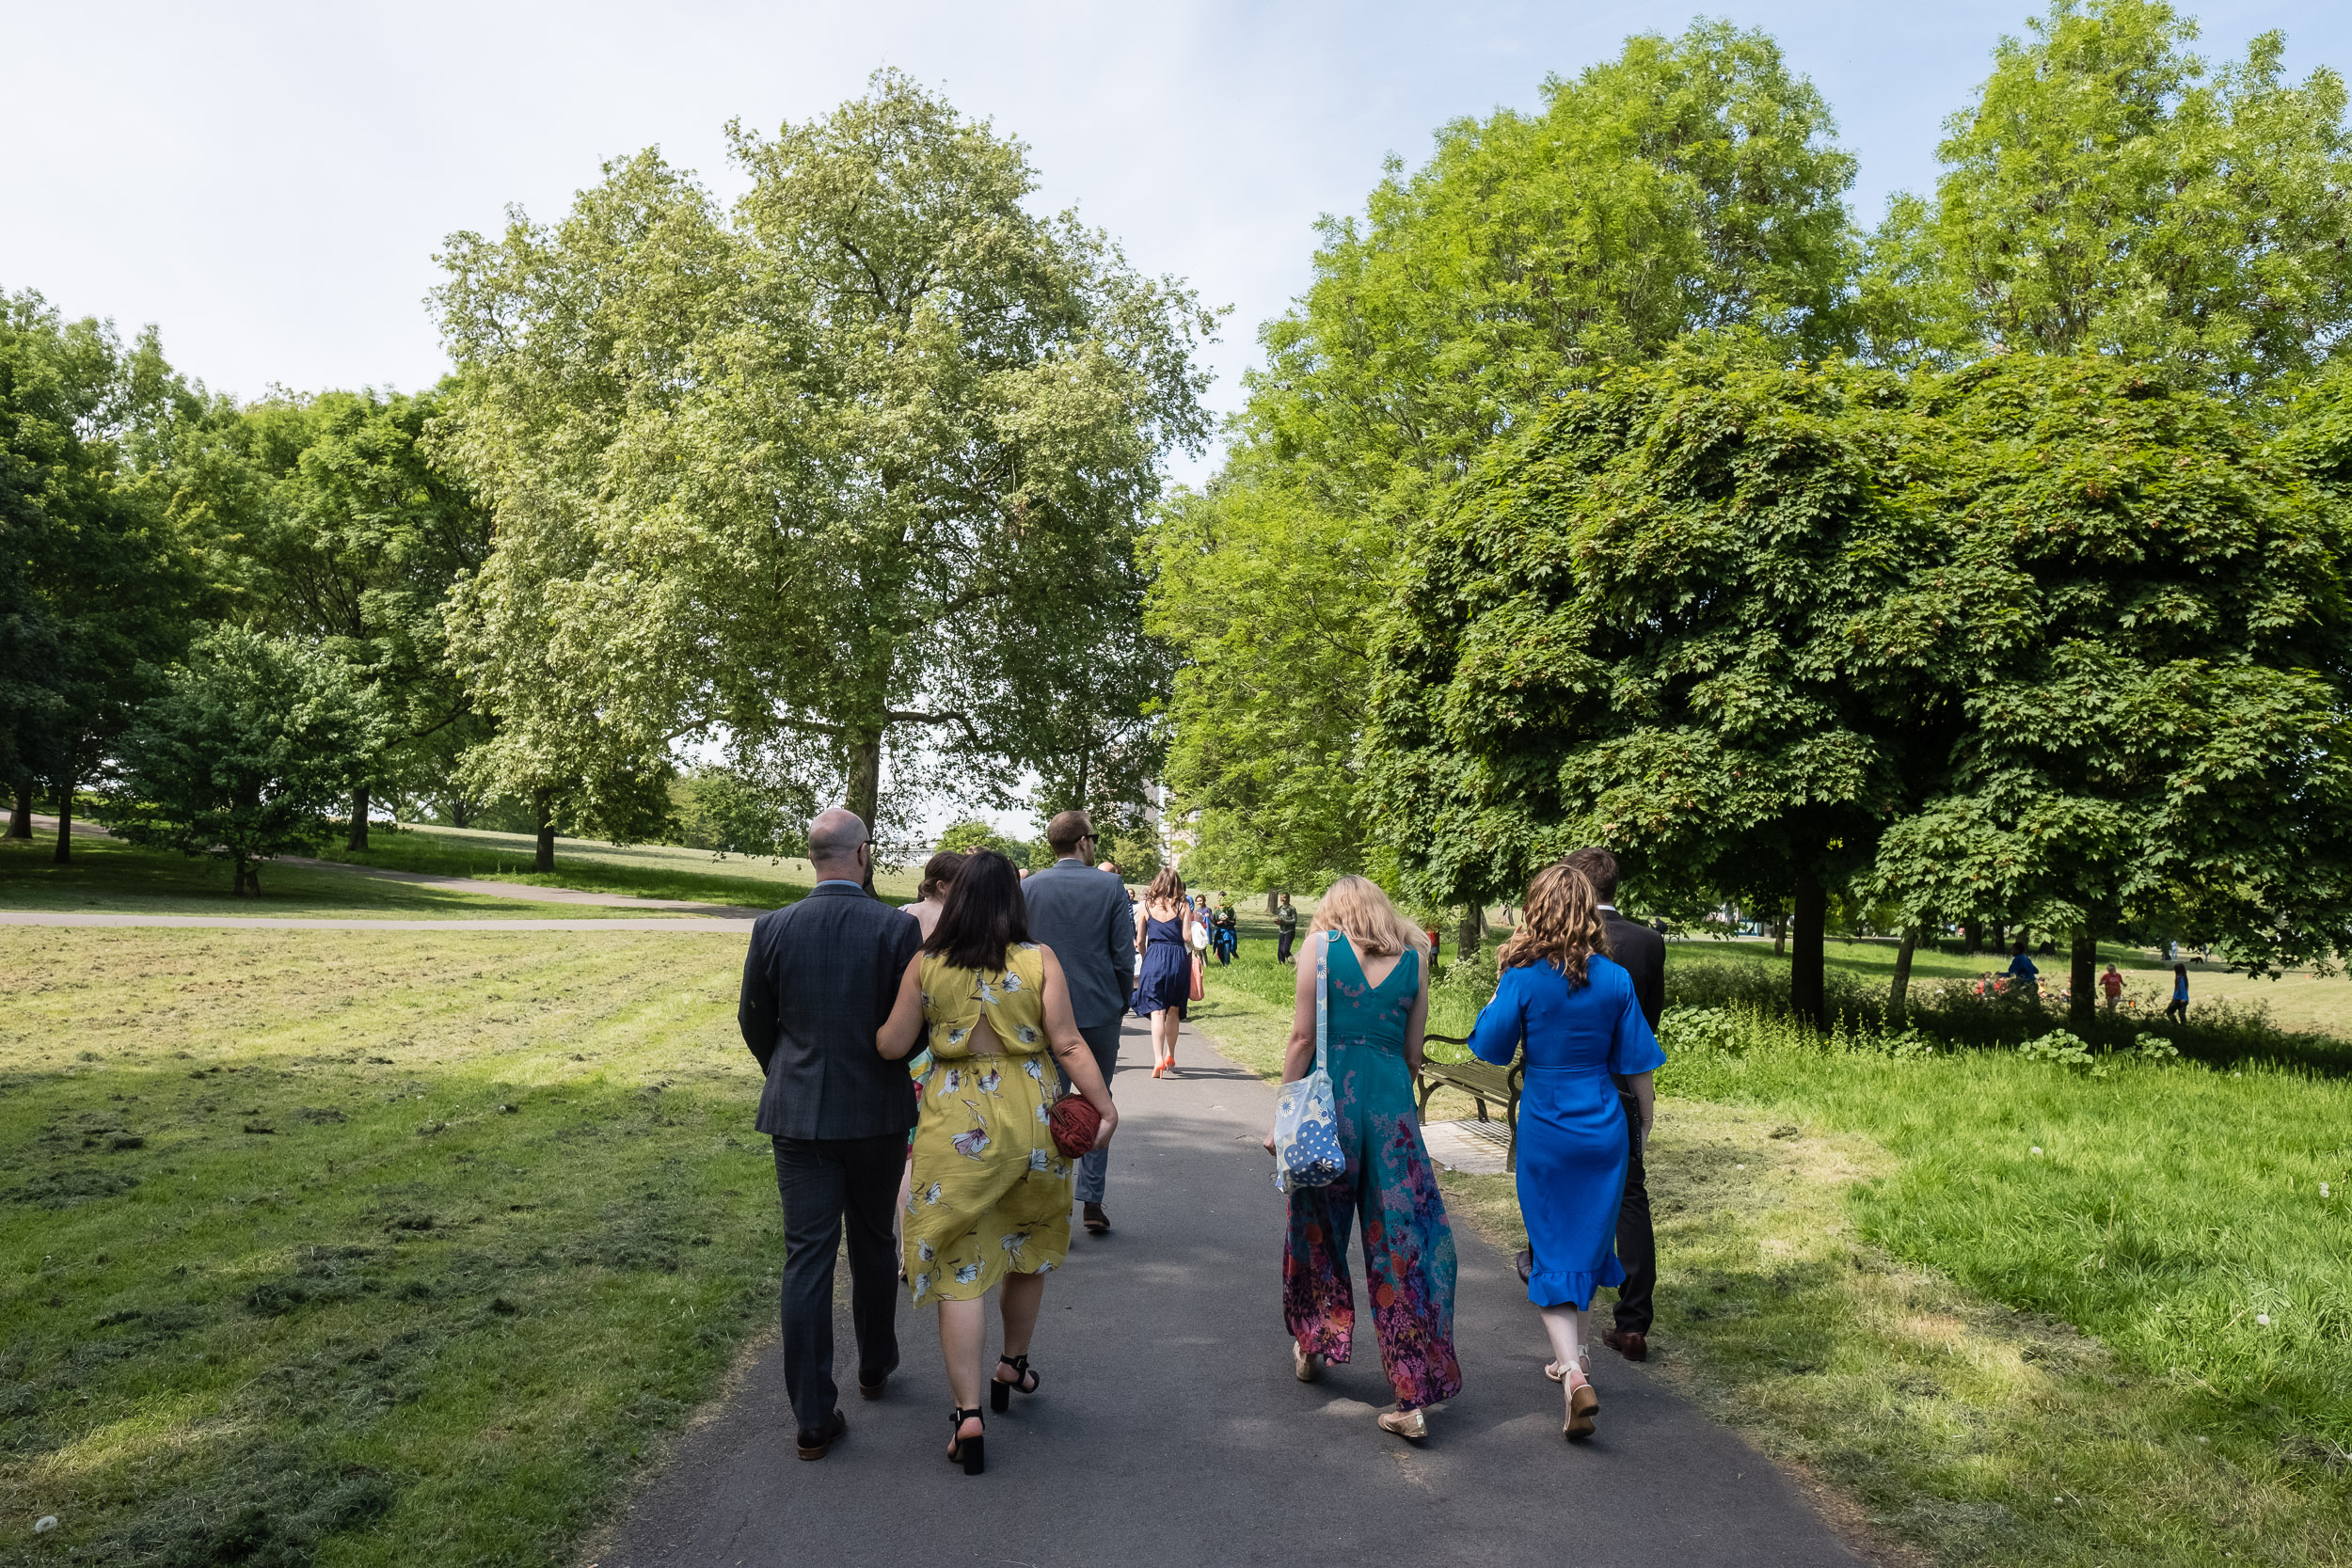 brockwell-lido-brixton-herne-hill-wedding-099.jpg